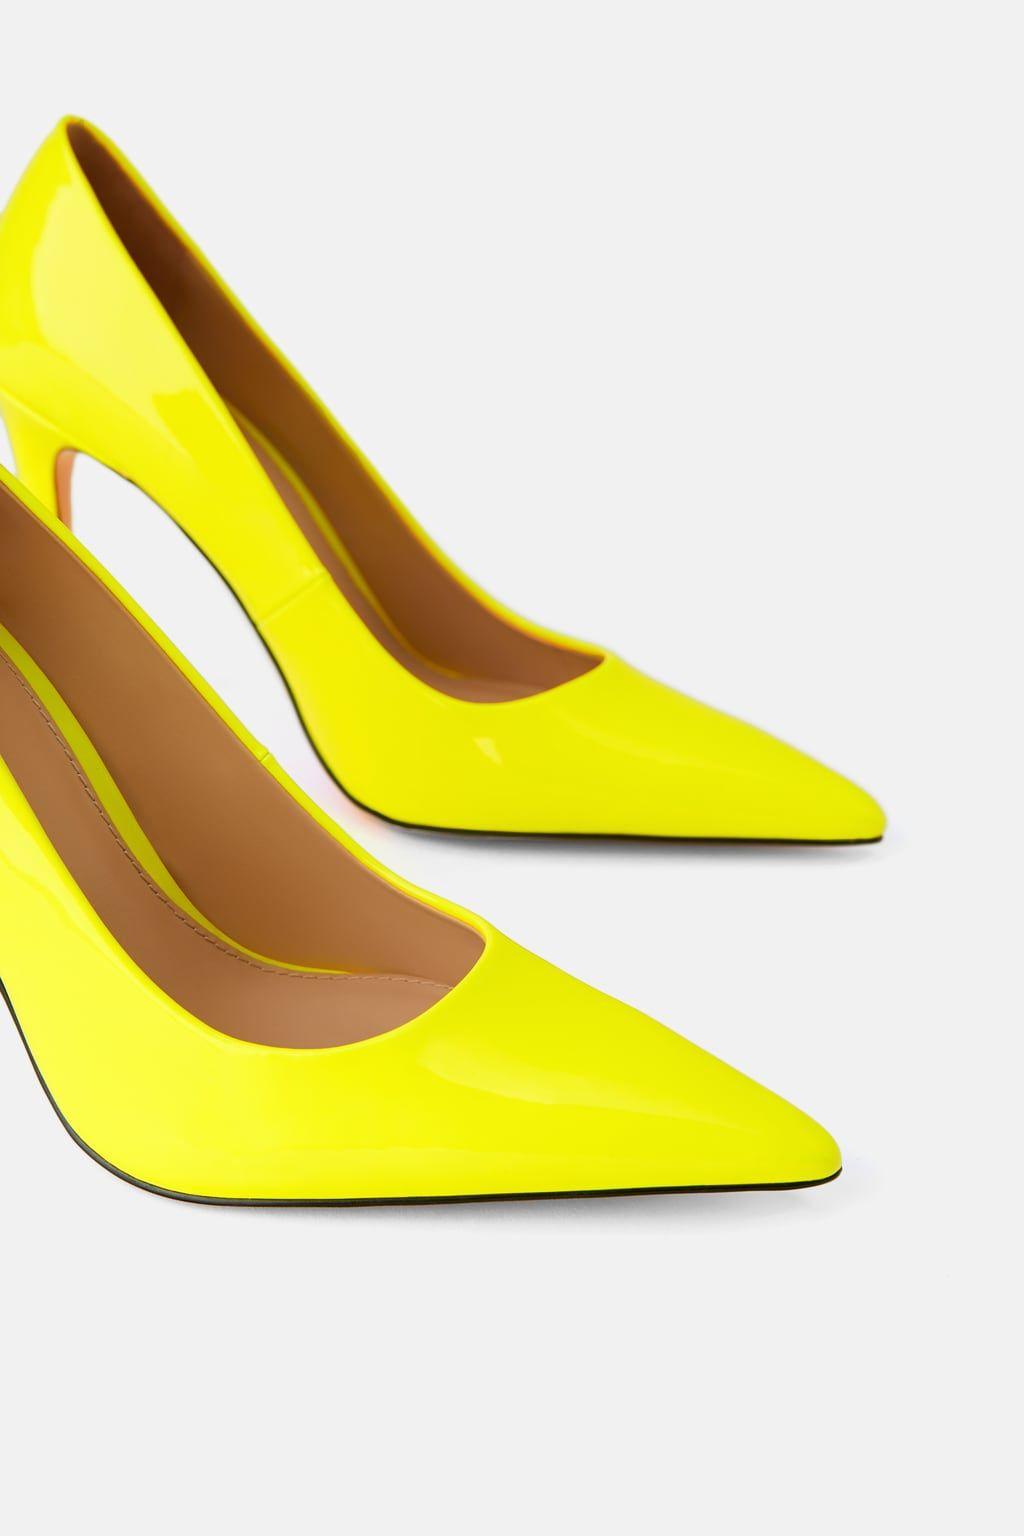 Zara Nel Per Il Novità ScarpeLe 2019Dodatki Shoe xdBoeCr